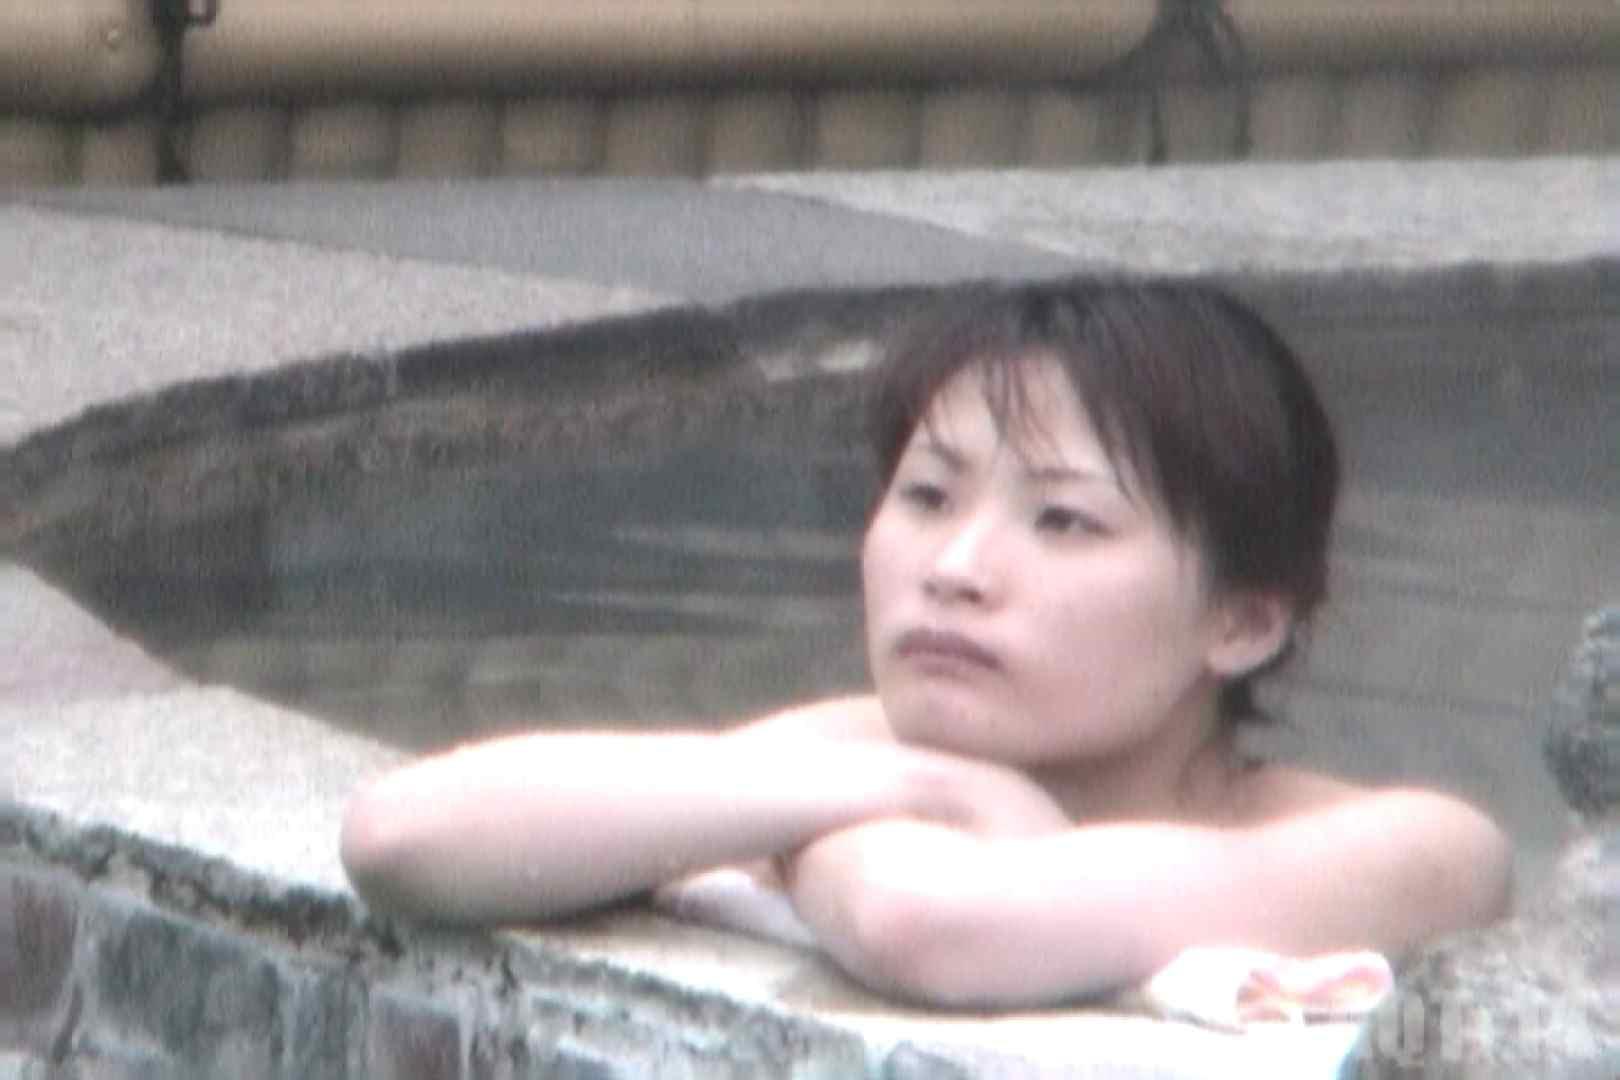 Aquaな露天風呂Vol.822 盗撮シリーズ | 露天風呂編  78PIX 25